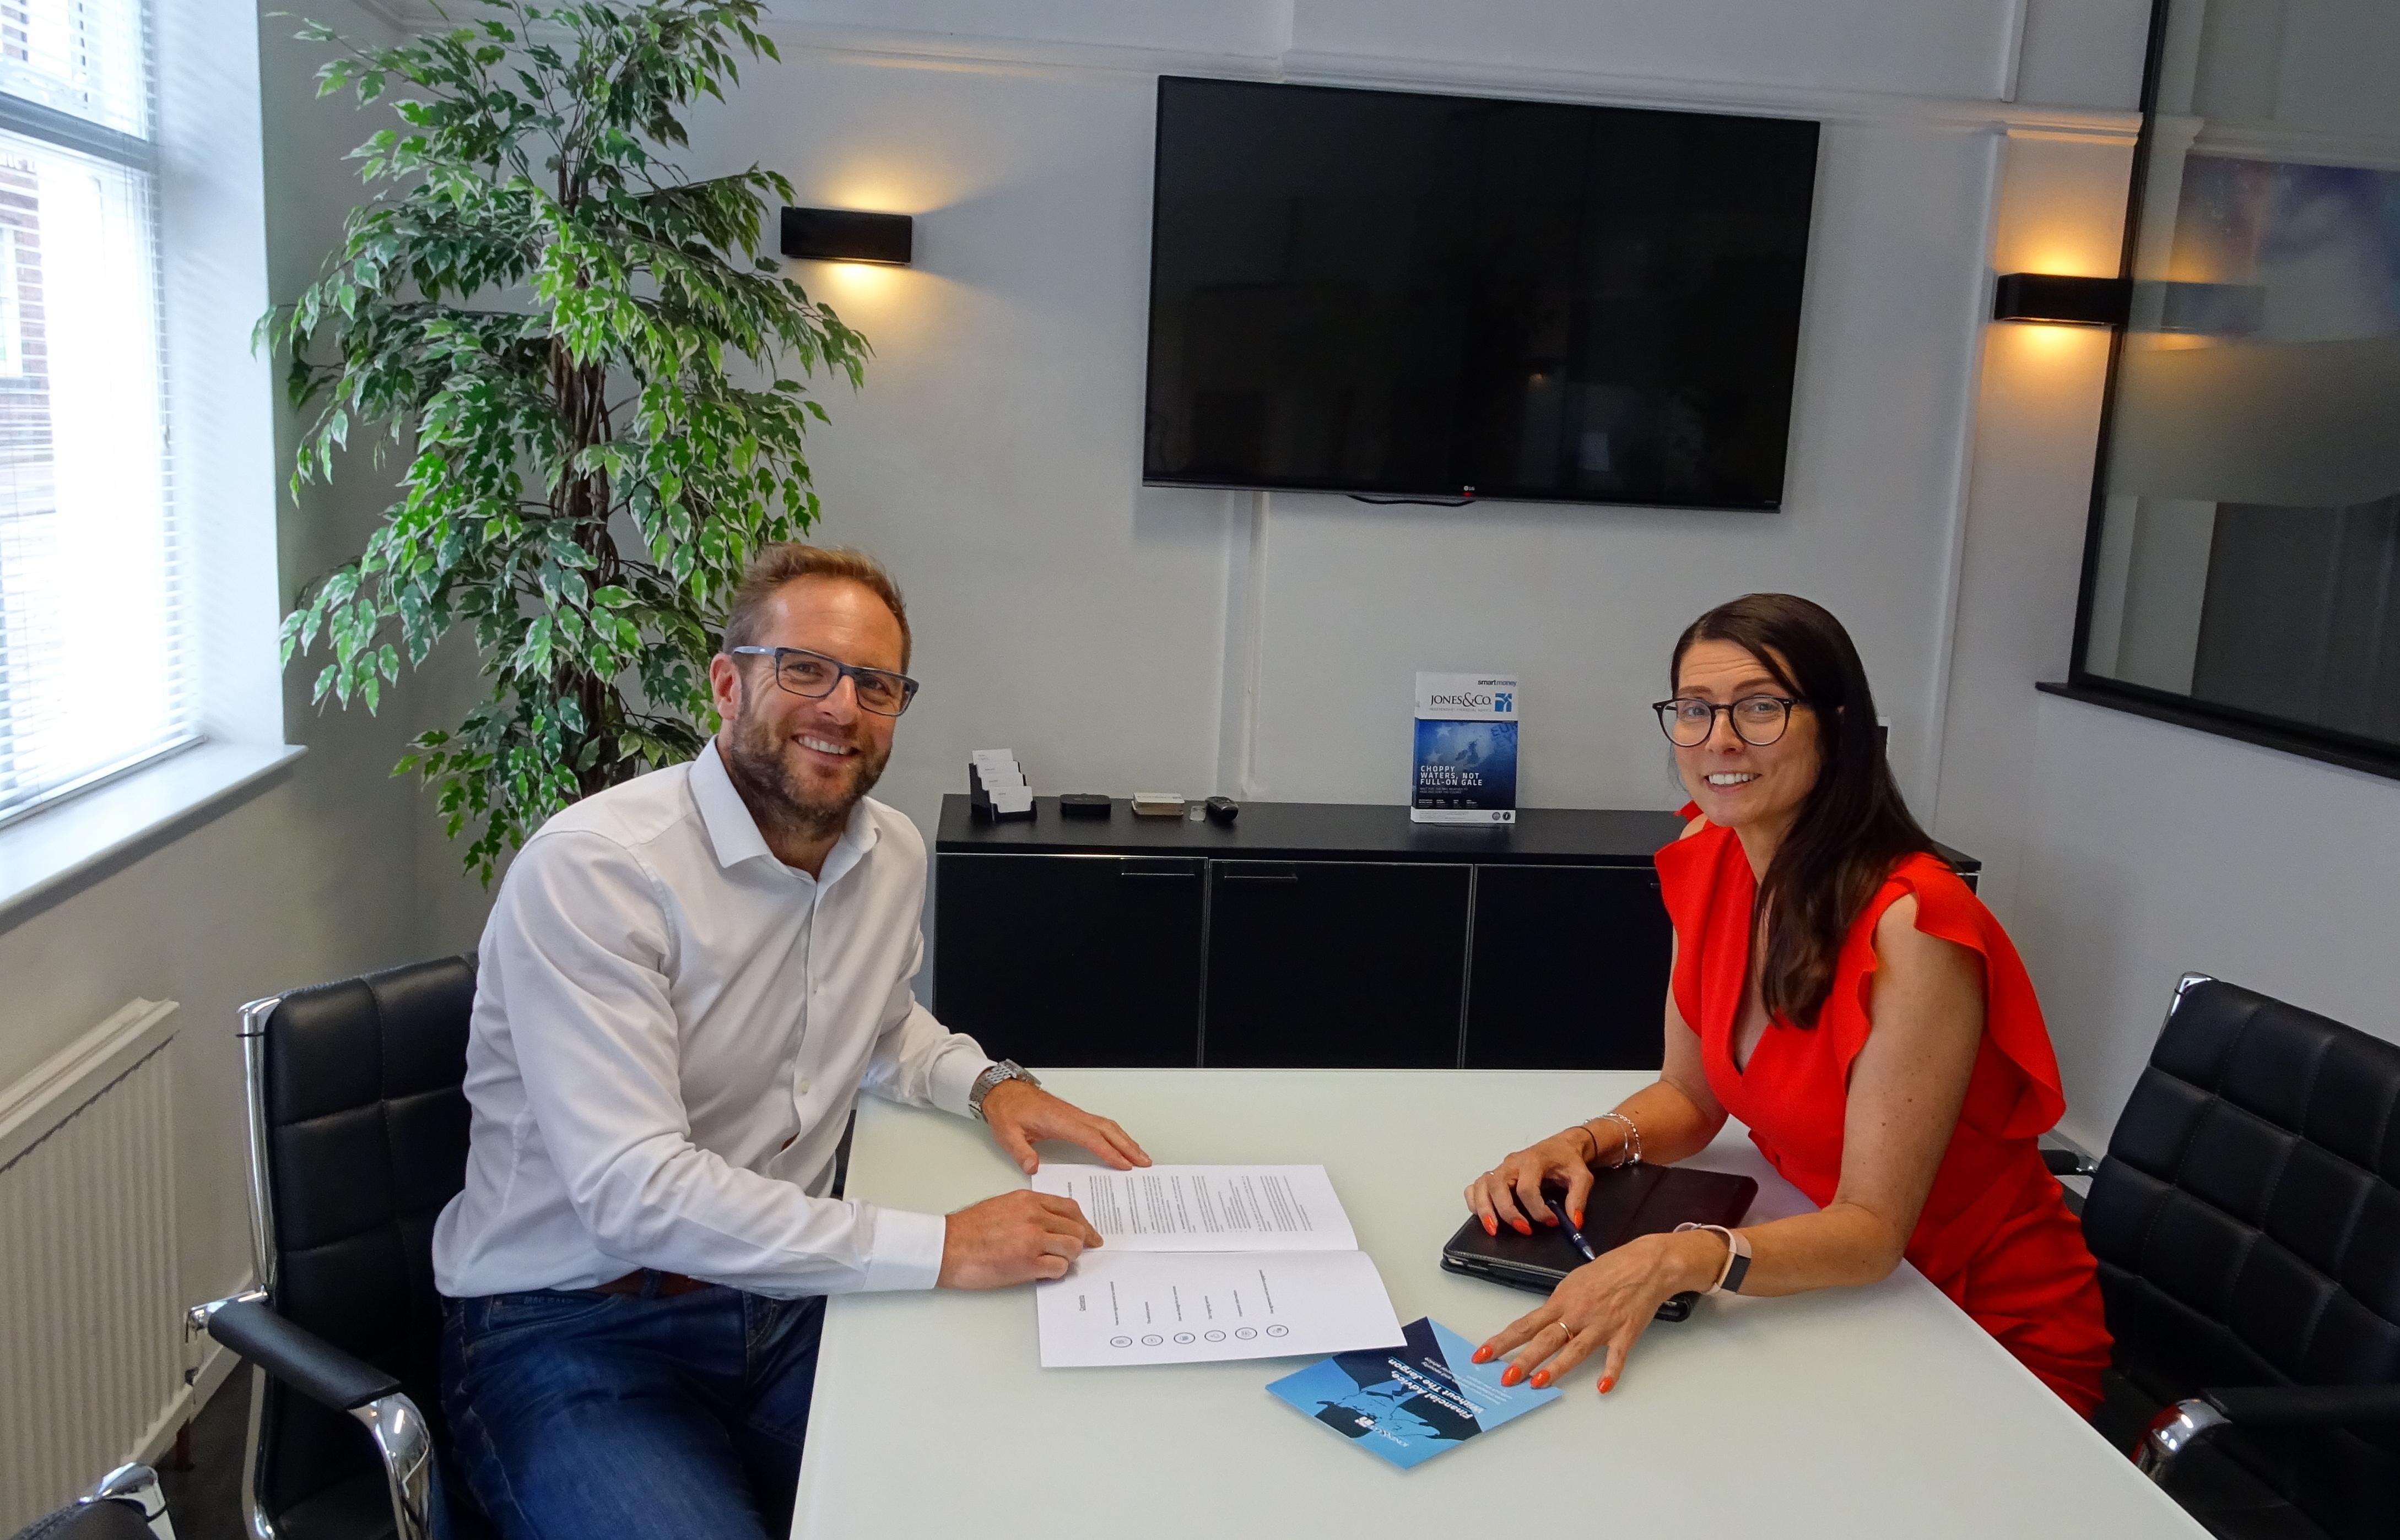 Experienced Financial Advisor Joins The Team!